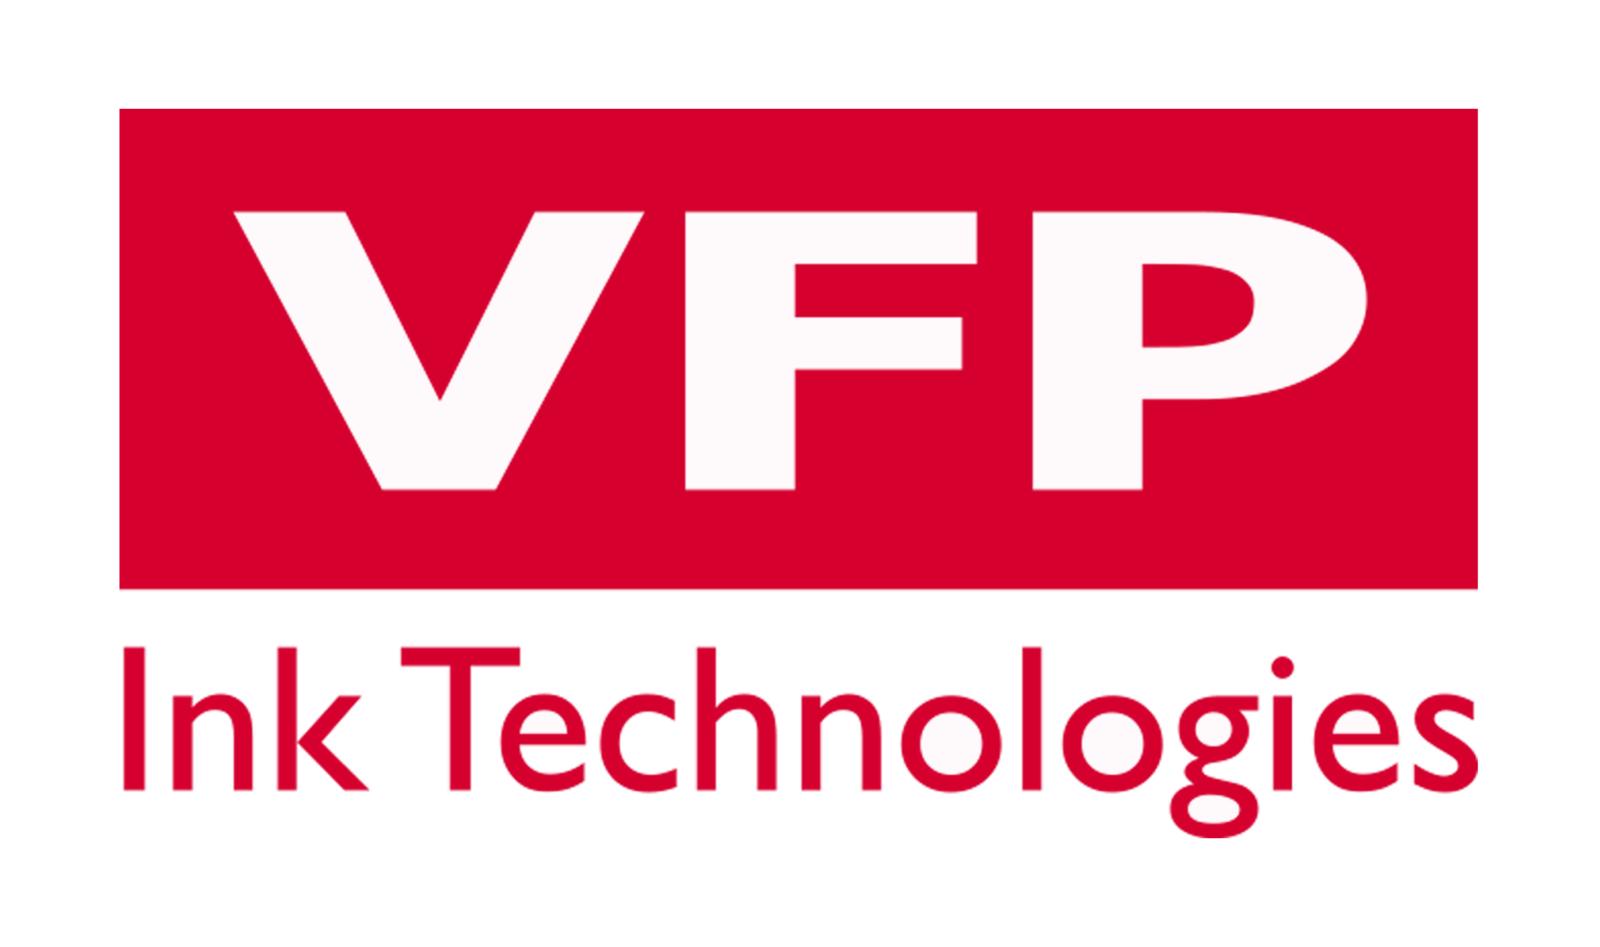 Logo Vfp Ink Technologies